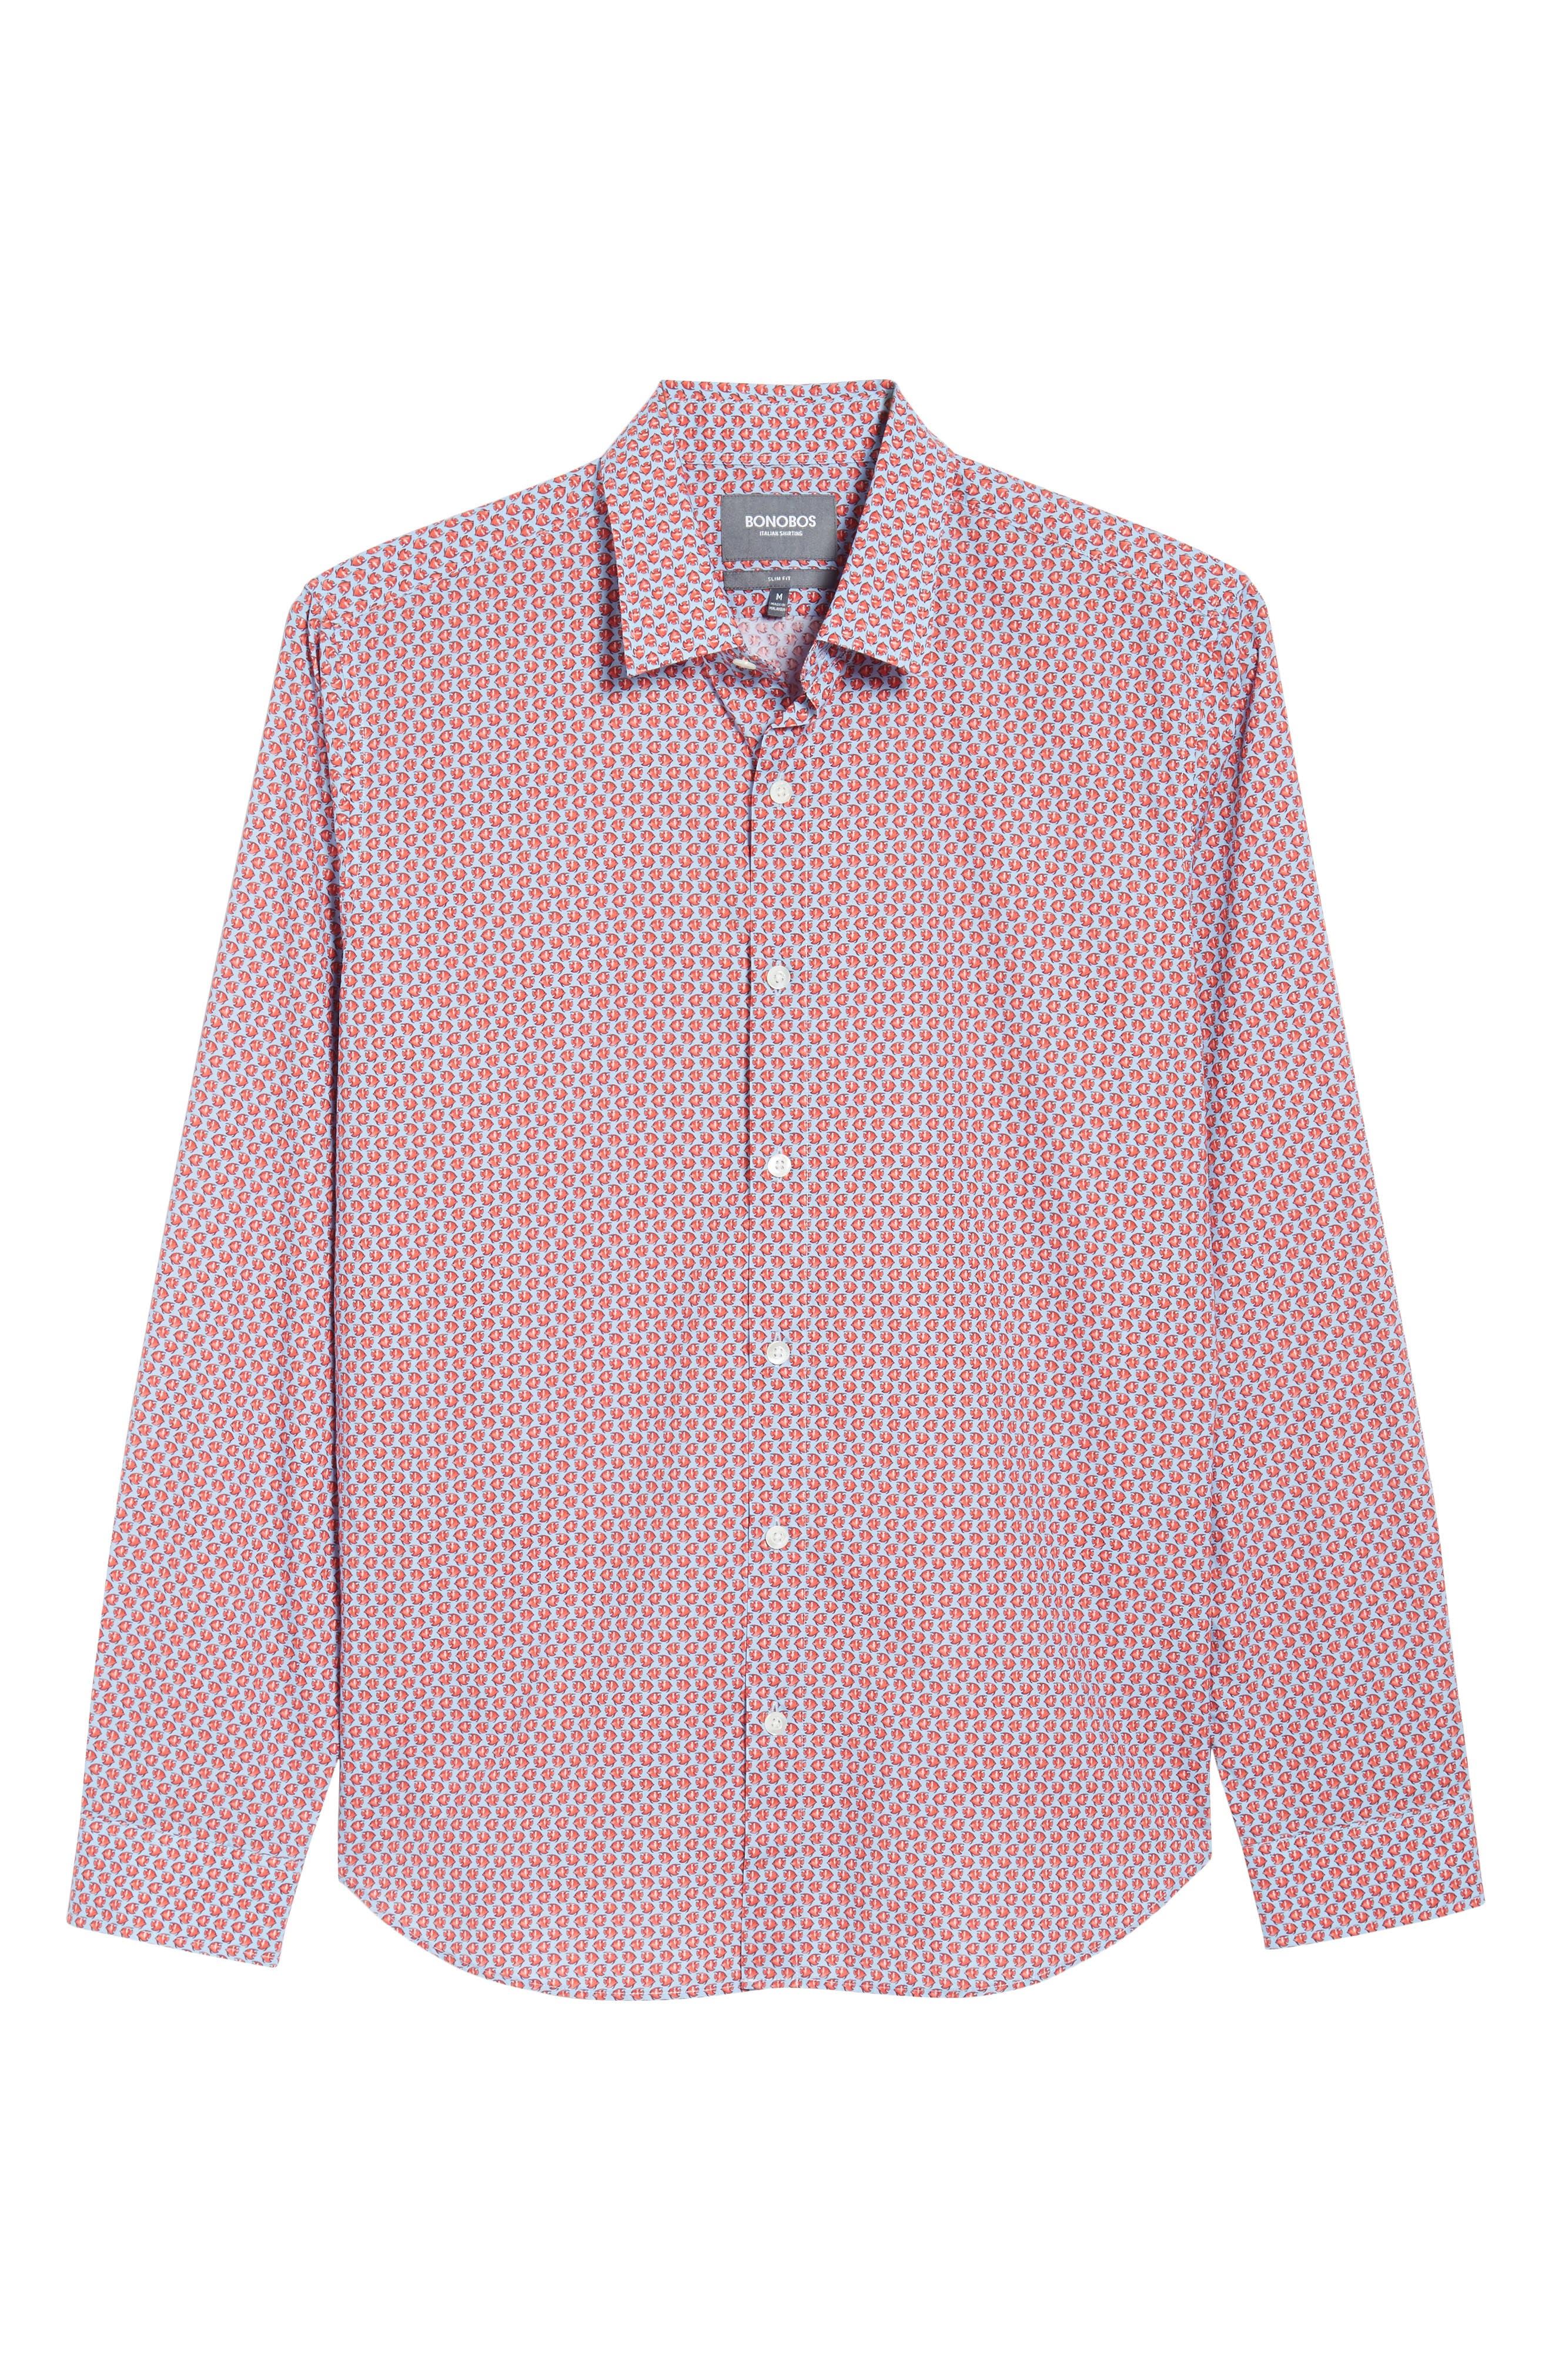 Premium Slim Fit Print Sport Shirt,                             Alternate thumbnail 6, color,                             600